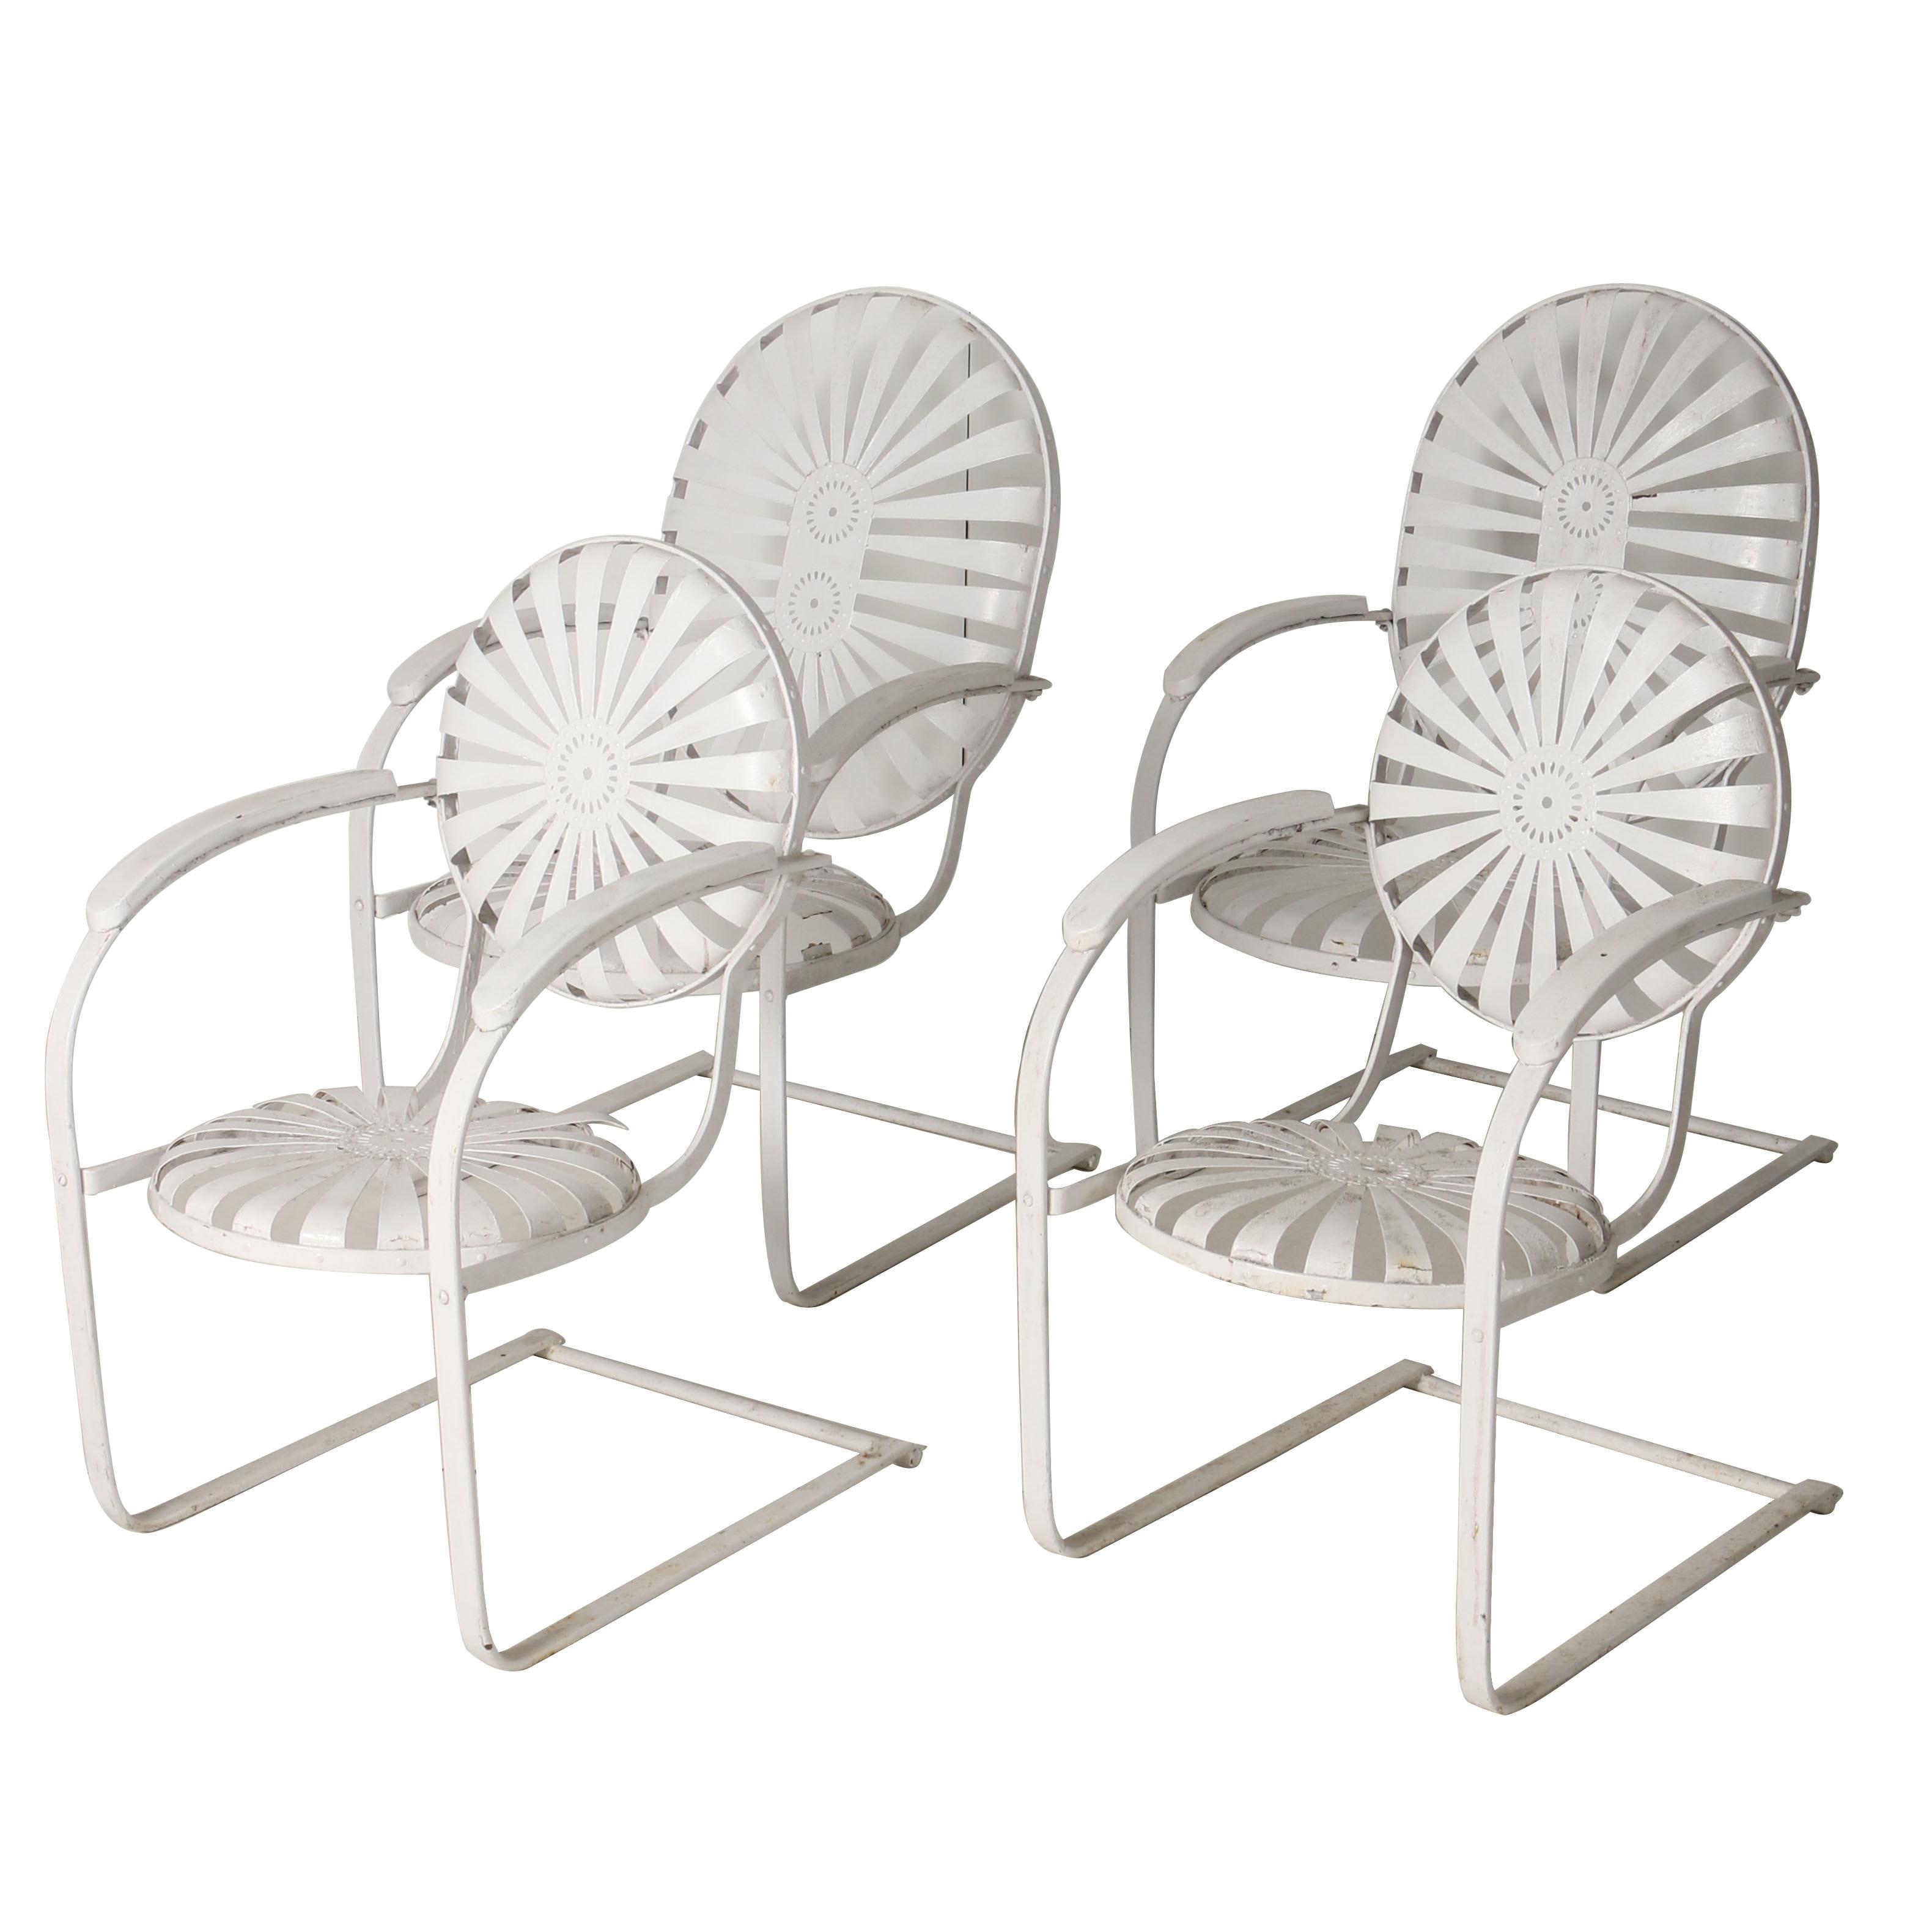 Four Vintage Sunburst Spring Back Chairs